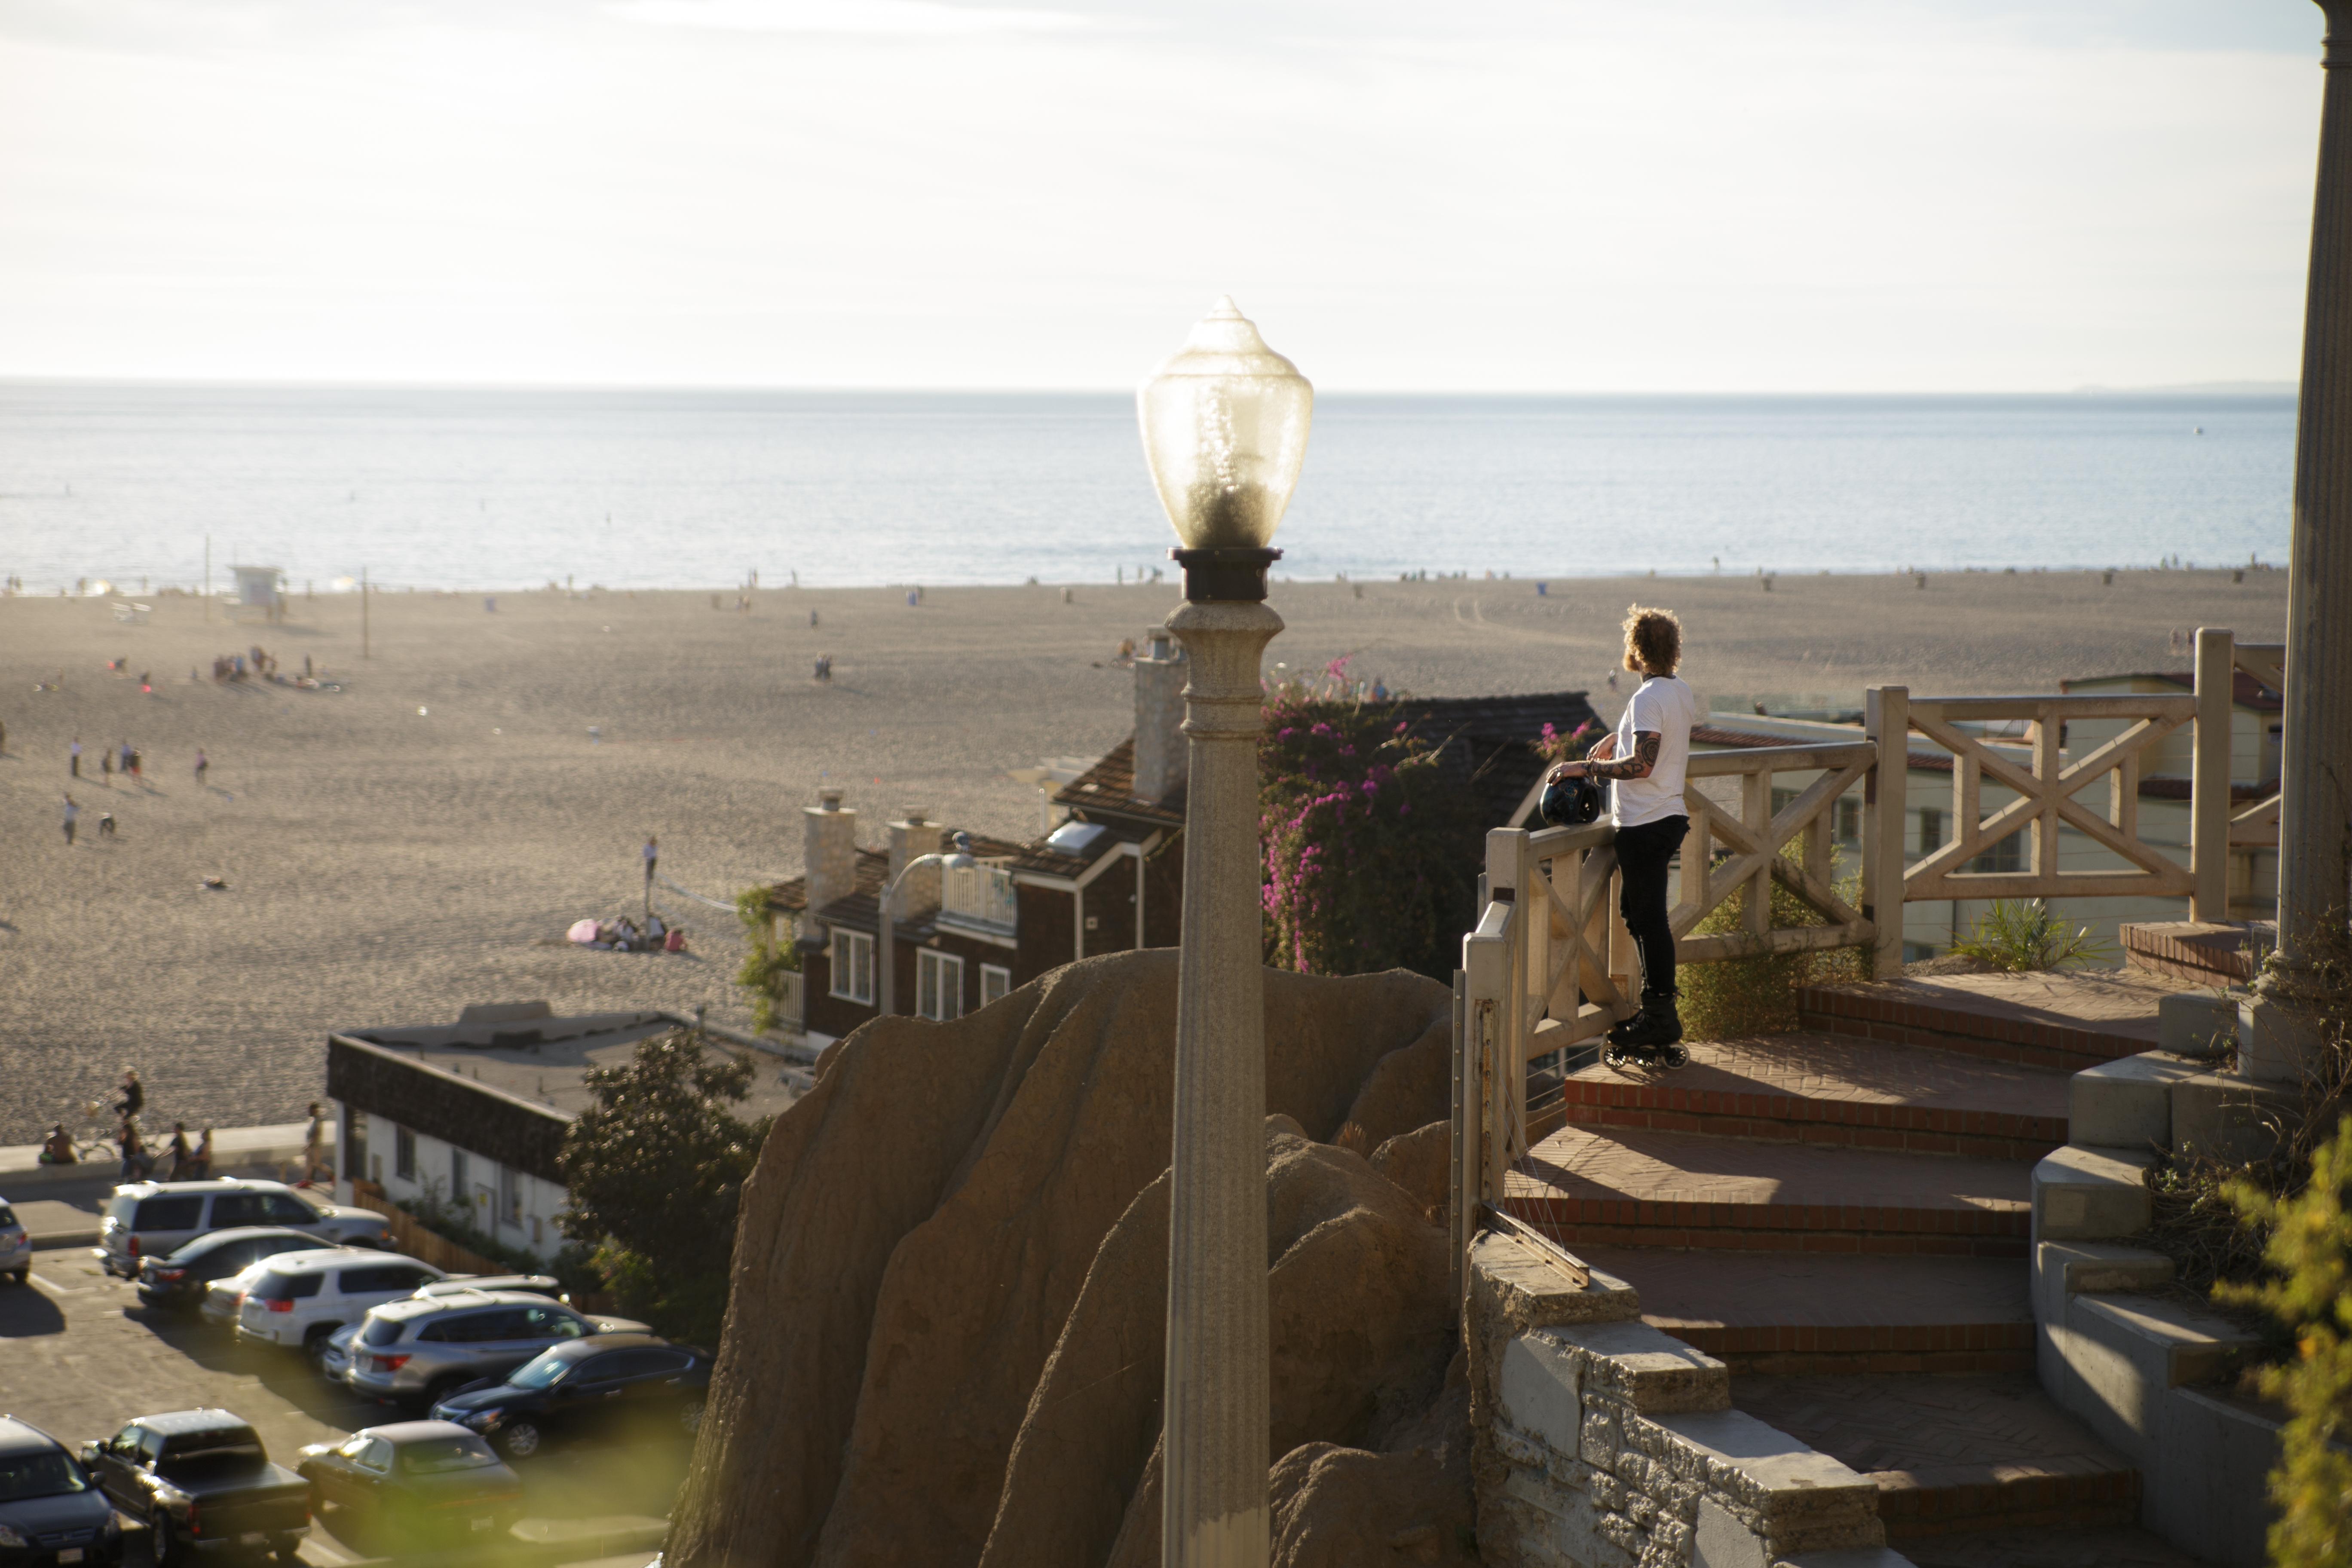 Caleb Smith in Santa Monica